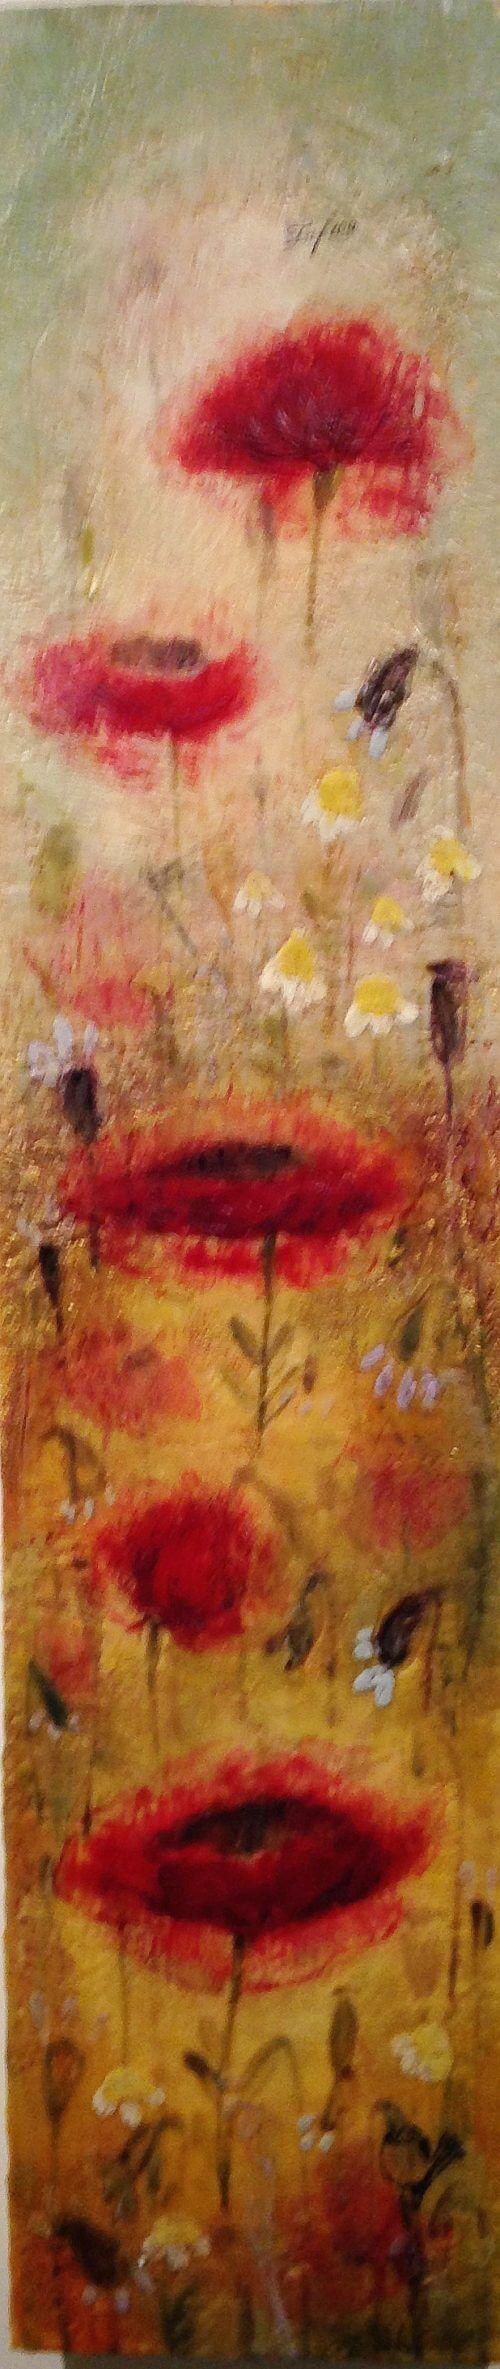 Tanya Kirouac Tall Poppies 36x8